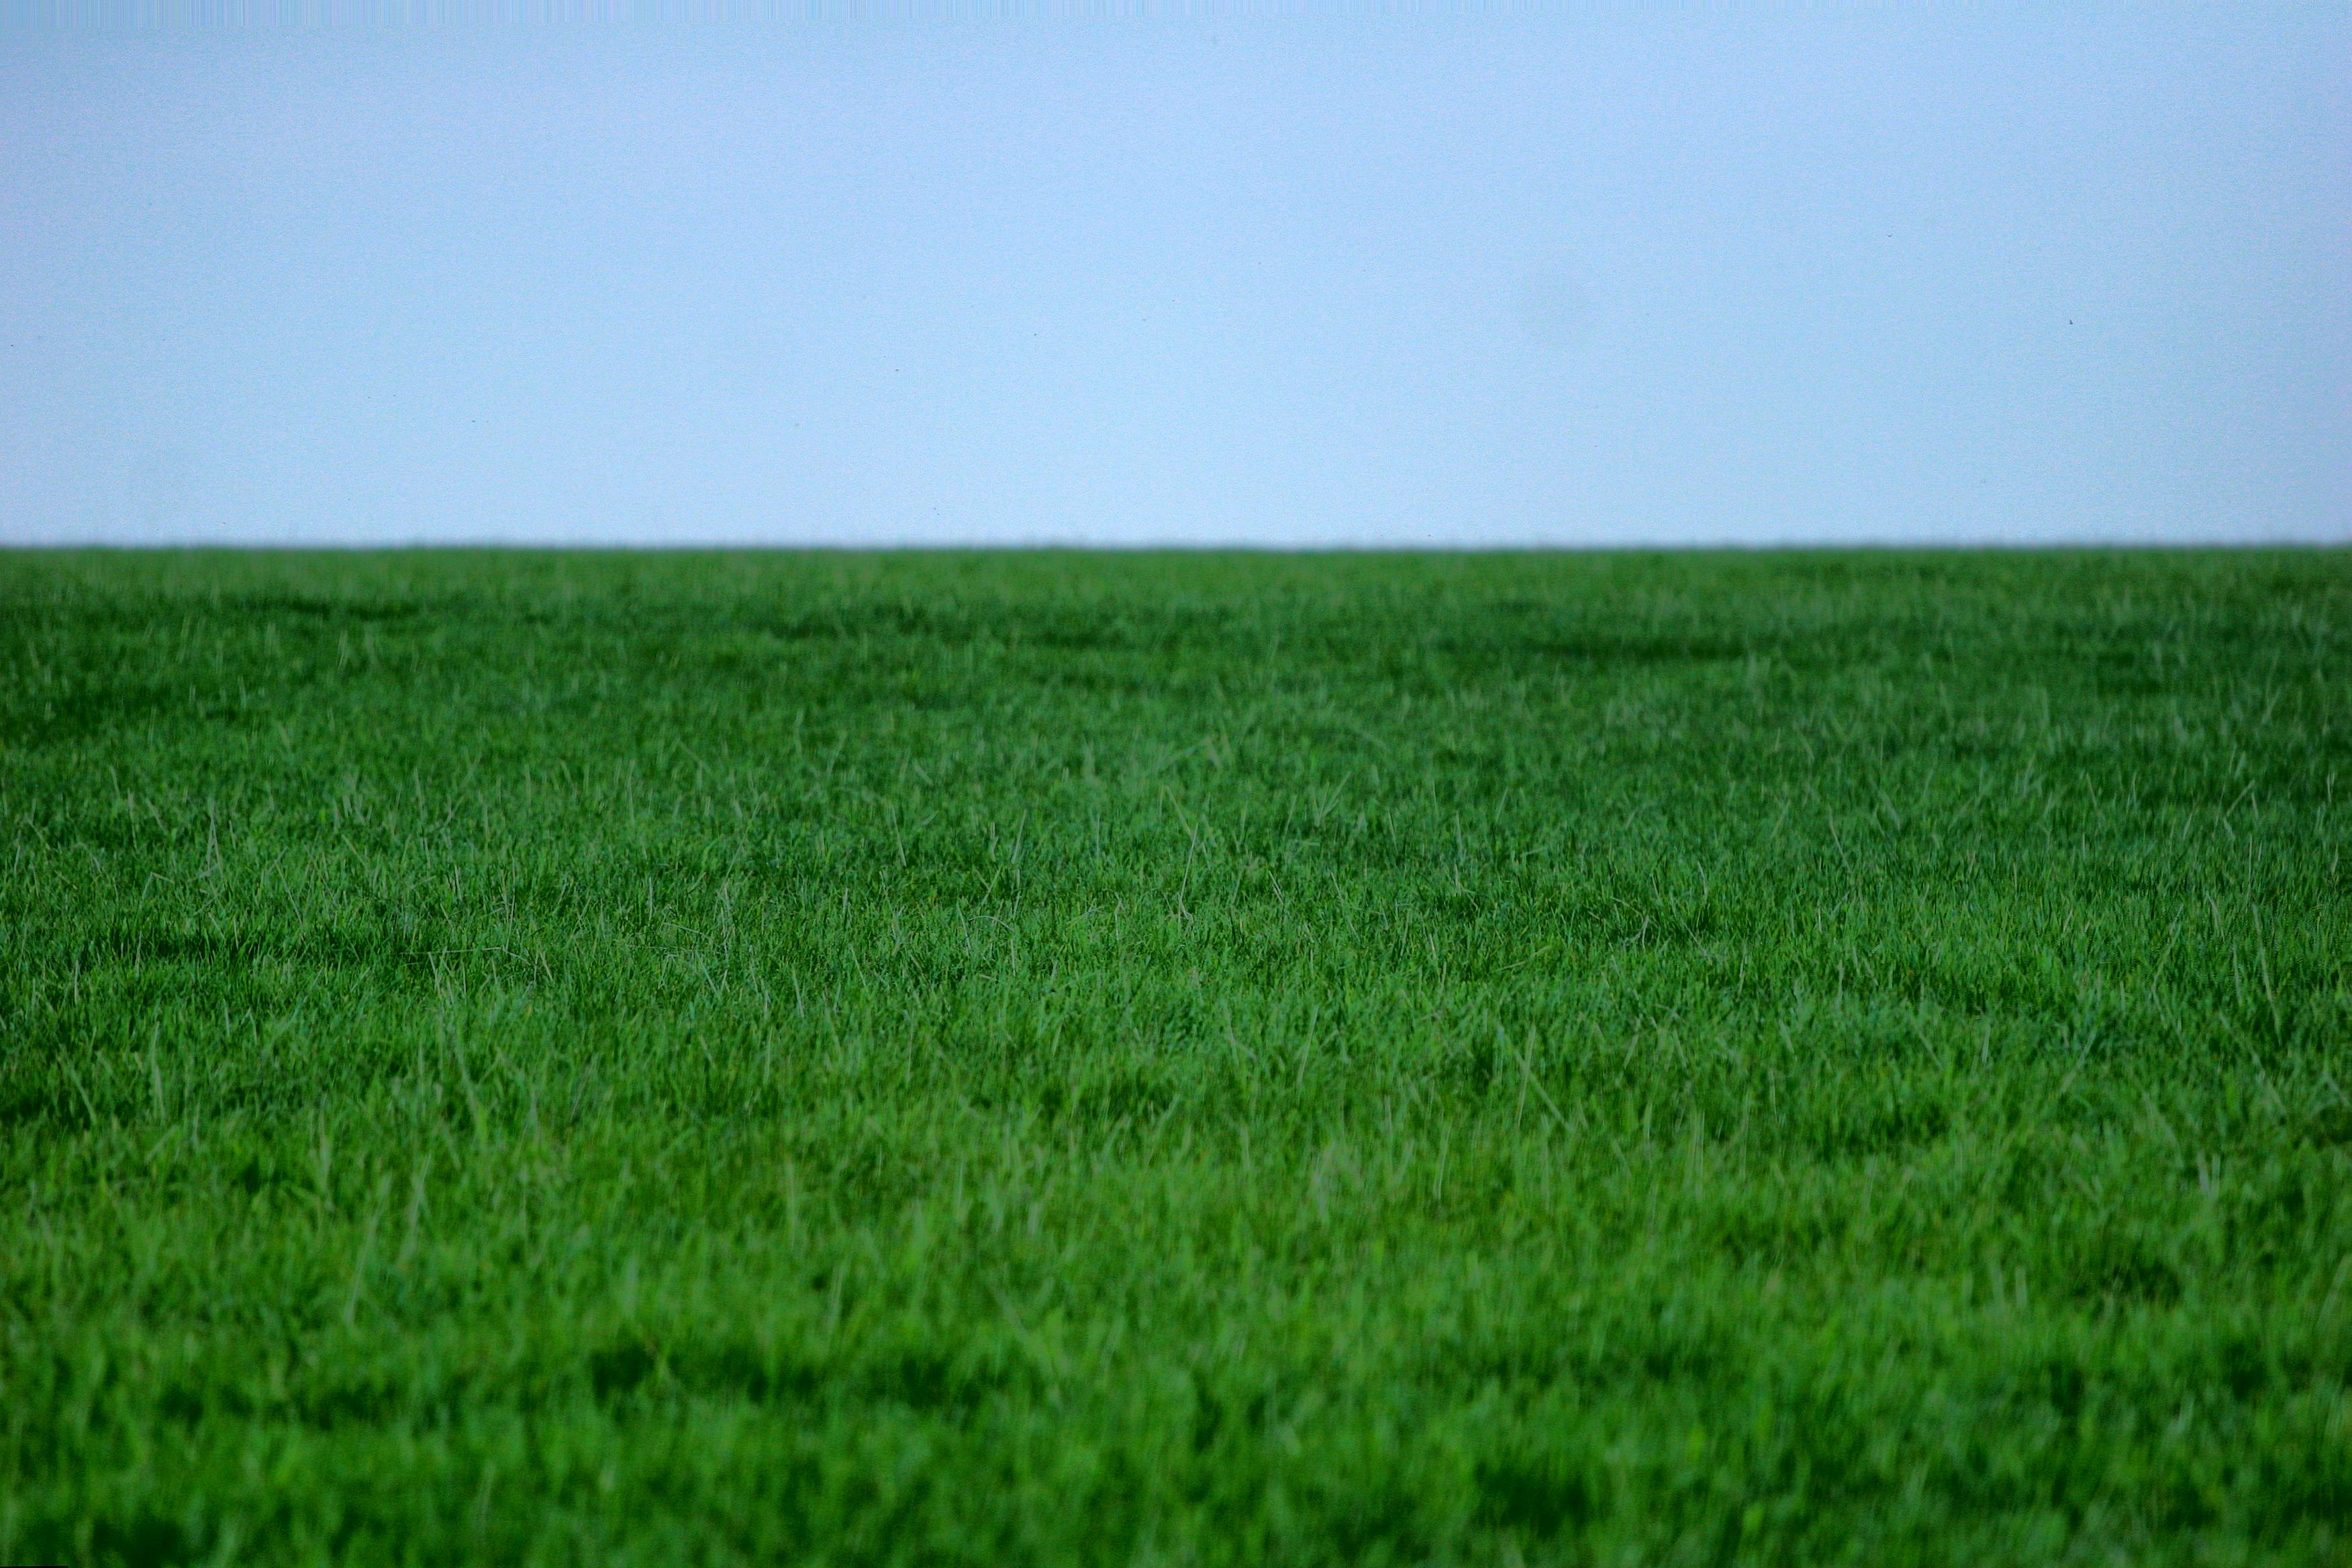 Green grass lawn photo